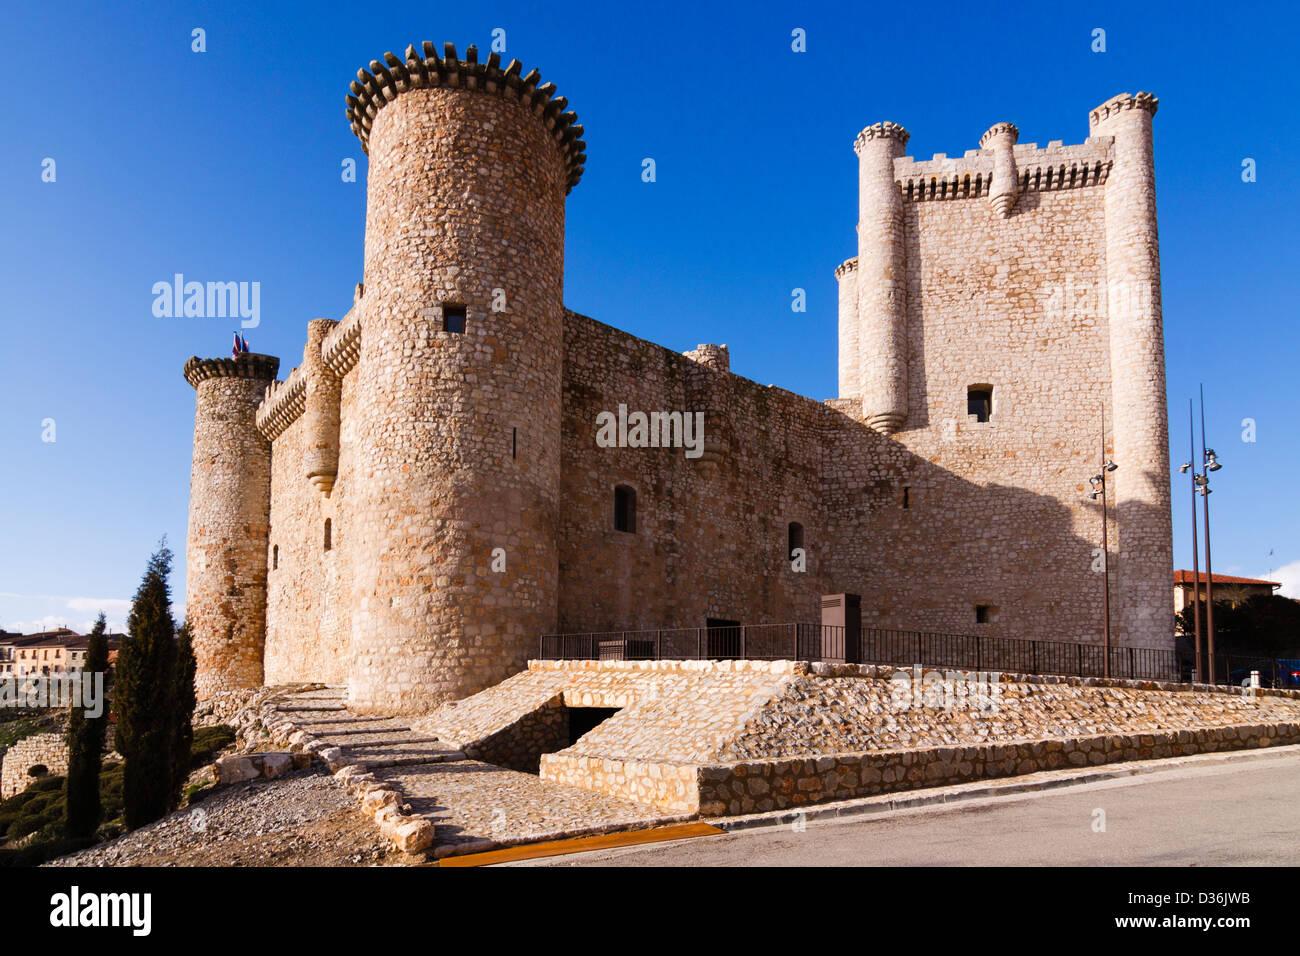 Templar Castle in Torija, Alcarria, Guadalajara province, Castile La Mancha, Spain. - Stock Image